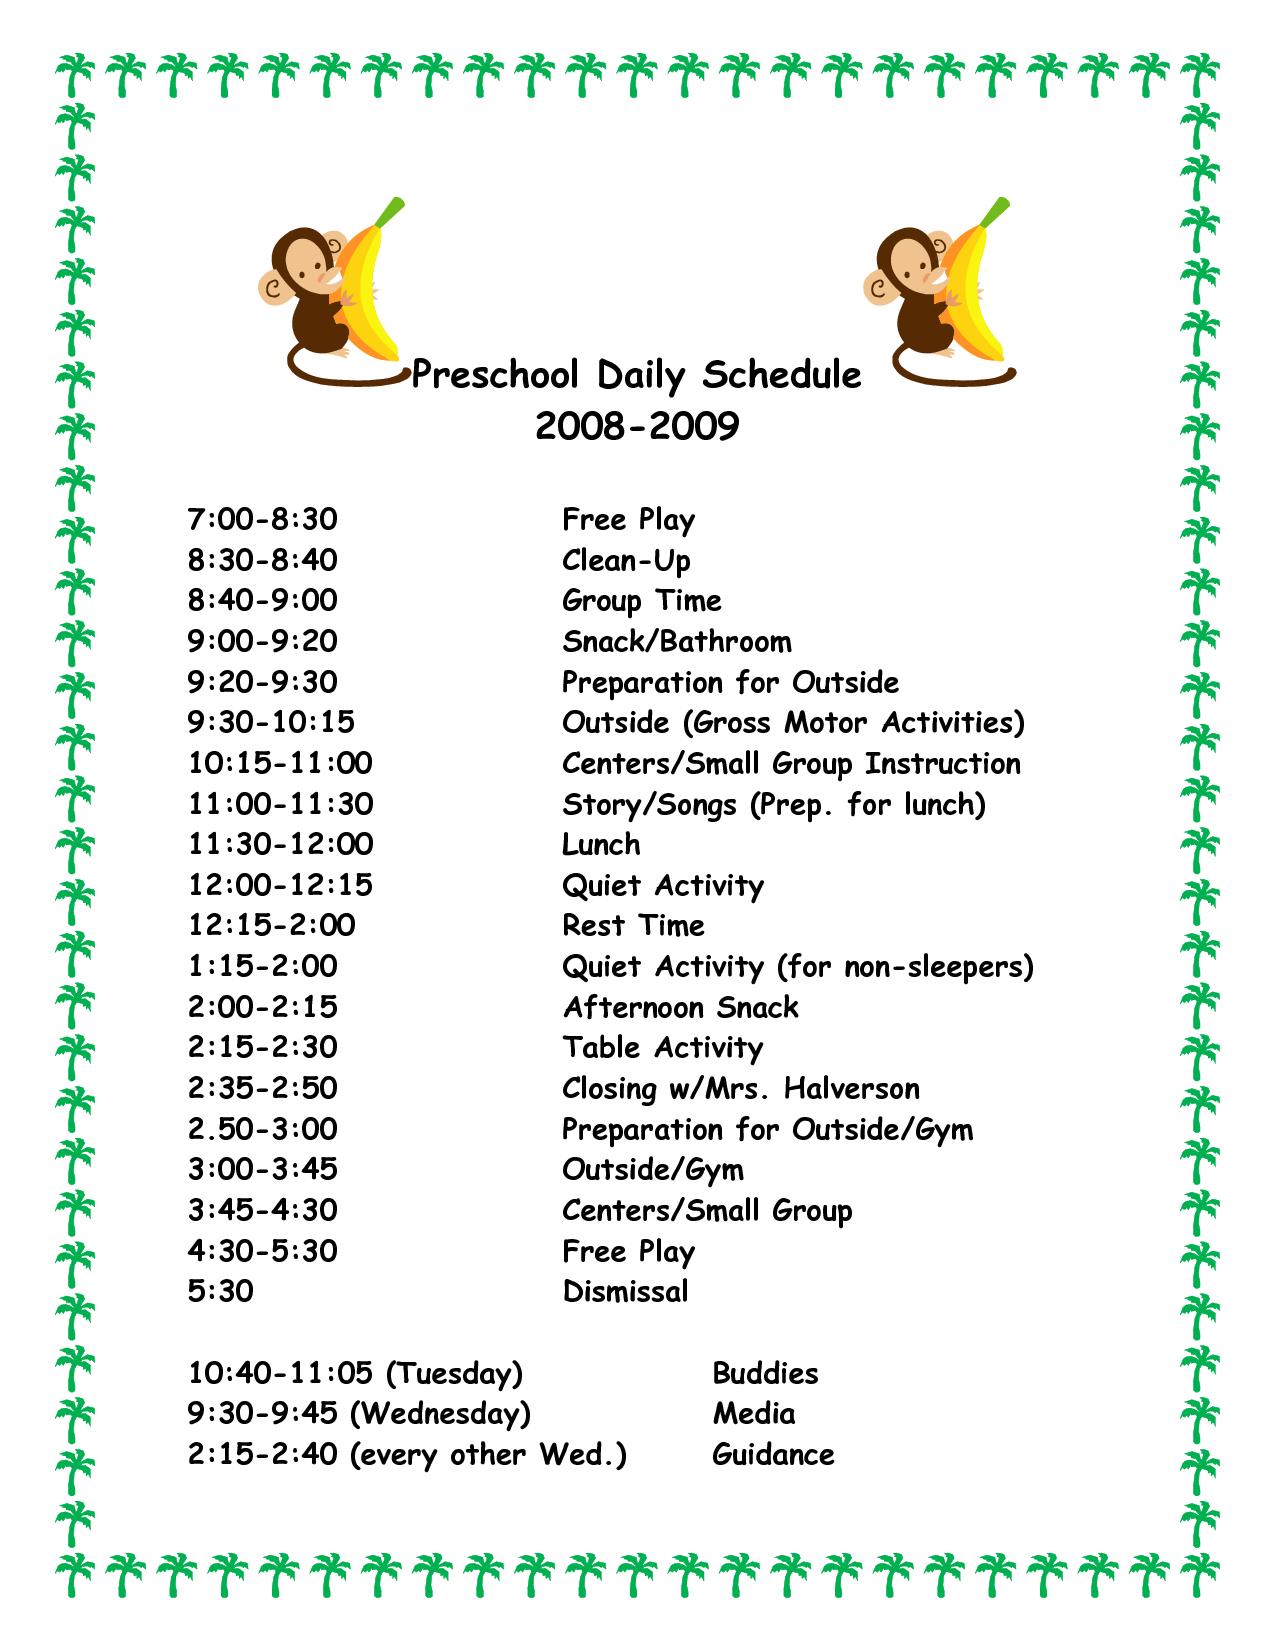 Daily Schedule Template For Preschool Printable Schedule